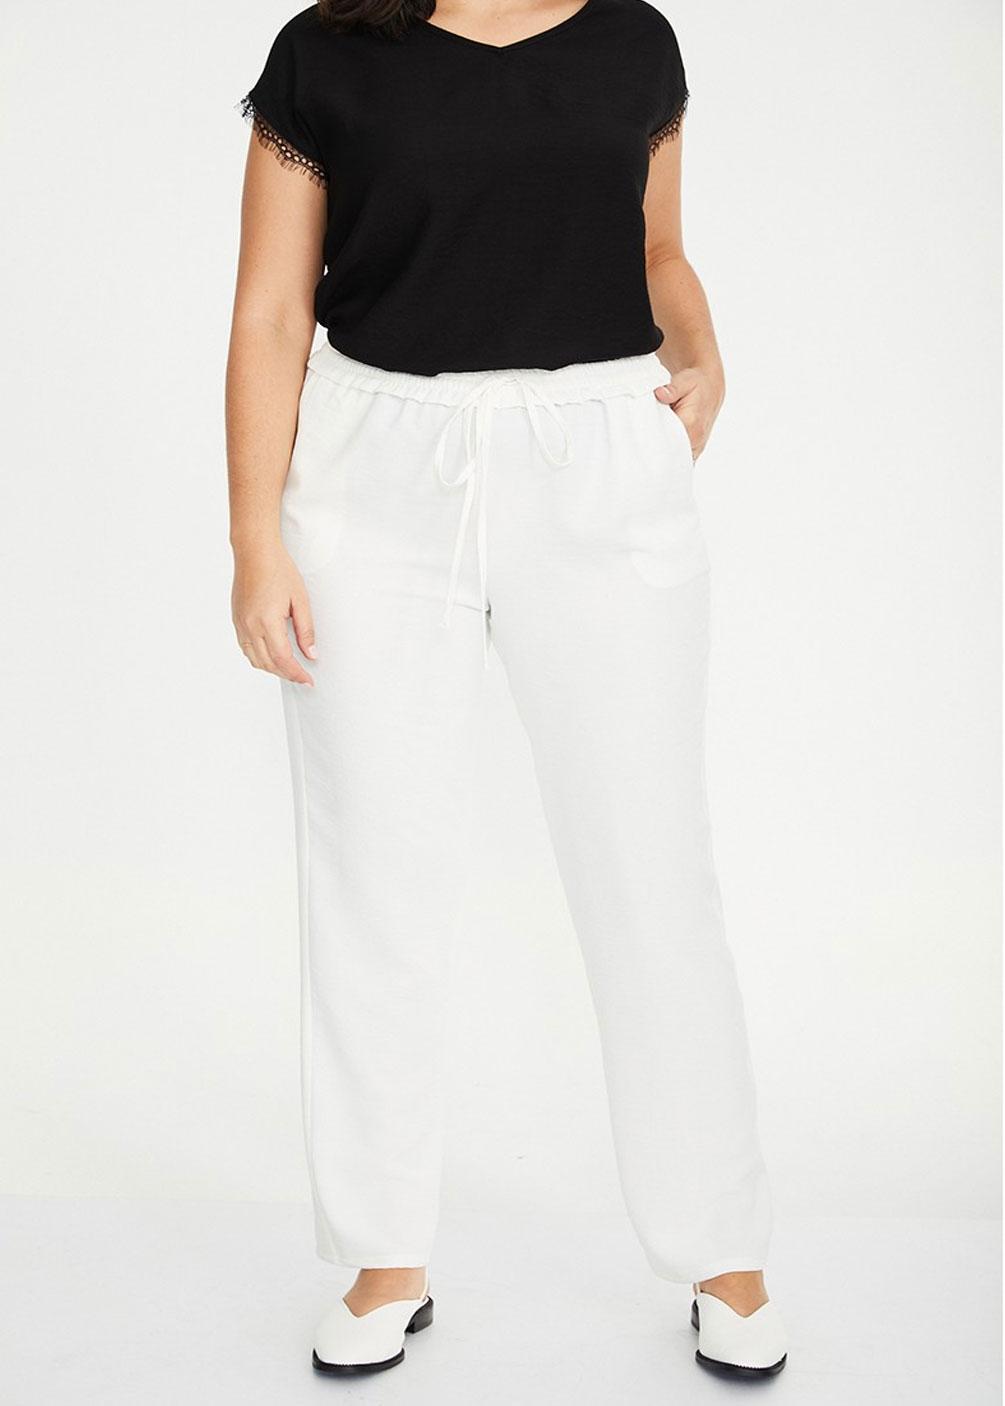 pantalon blanco tallas grandes spg carisal indra